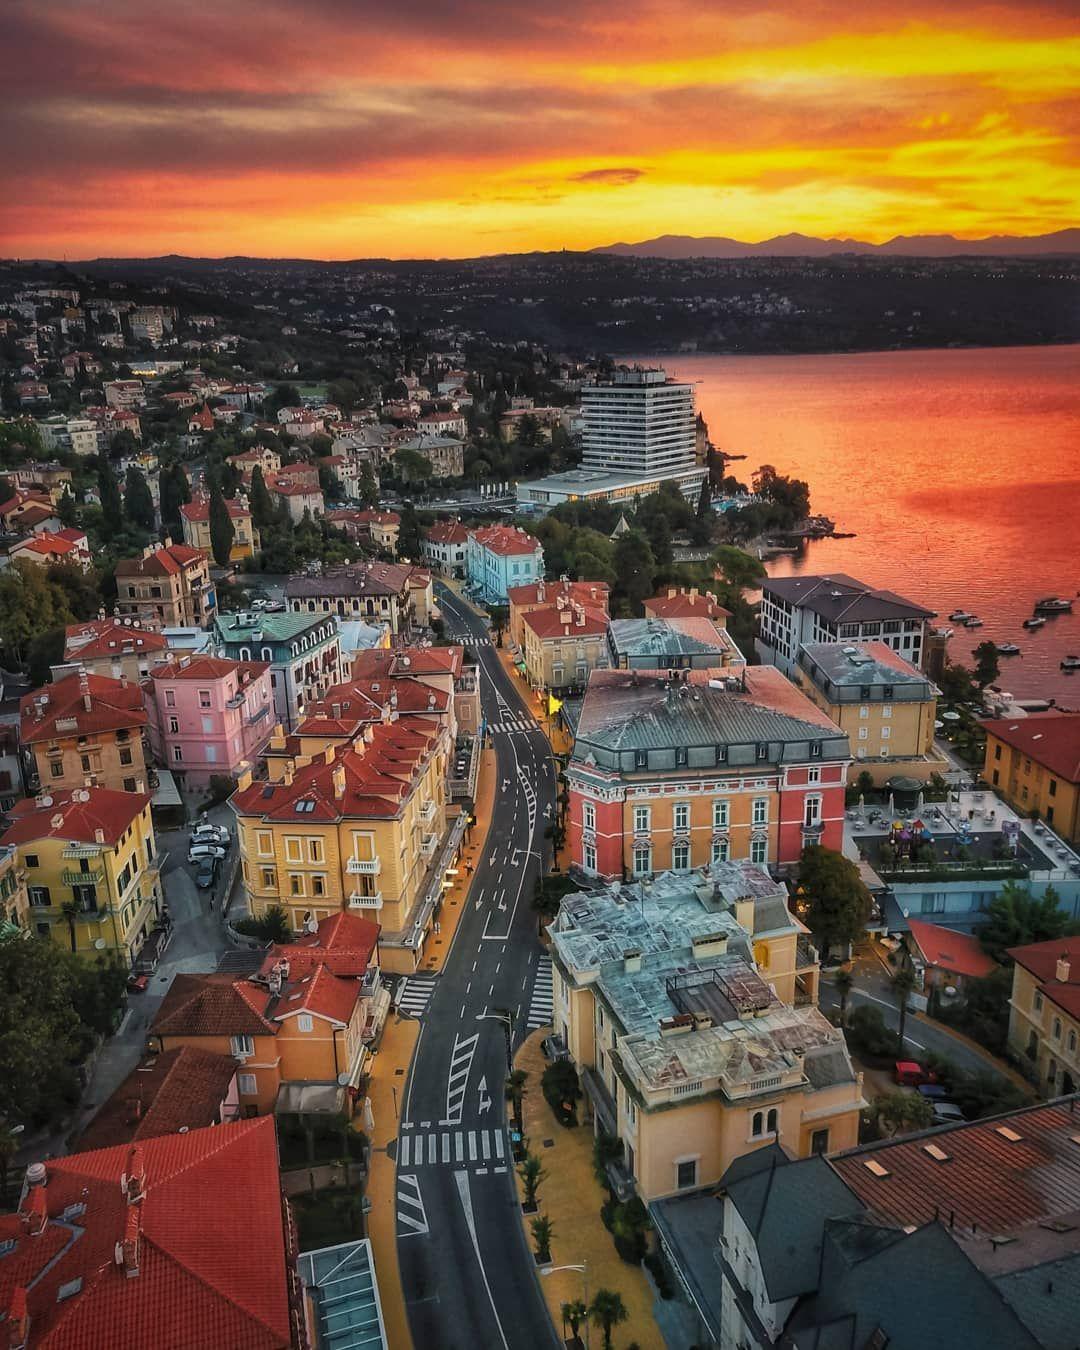 Franv On Instagram Opatija Croatia Sunrise In Opatija Opatija Croatia Sunrise Hrvatska Adriaticsea A Europe Travel Croatia Places To Visit